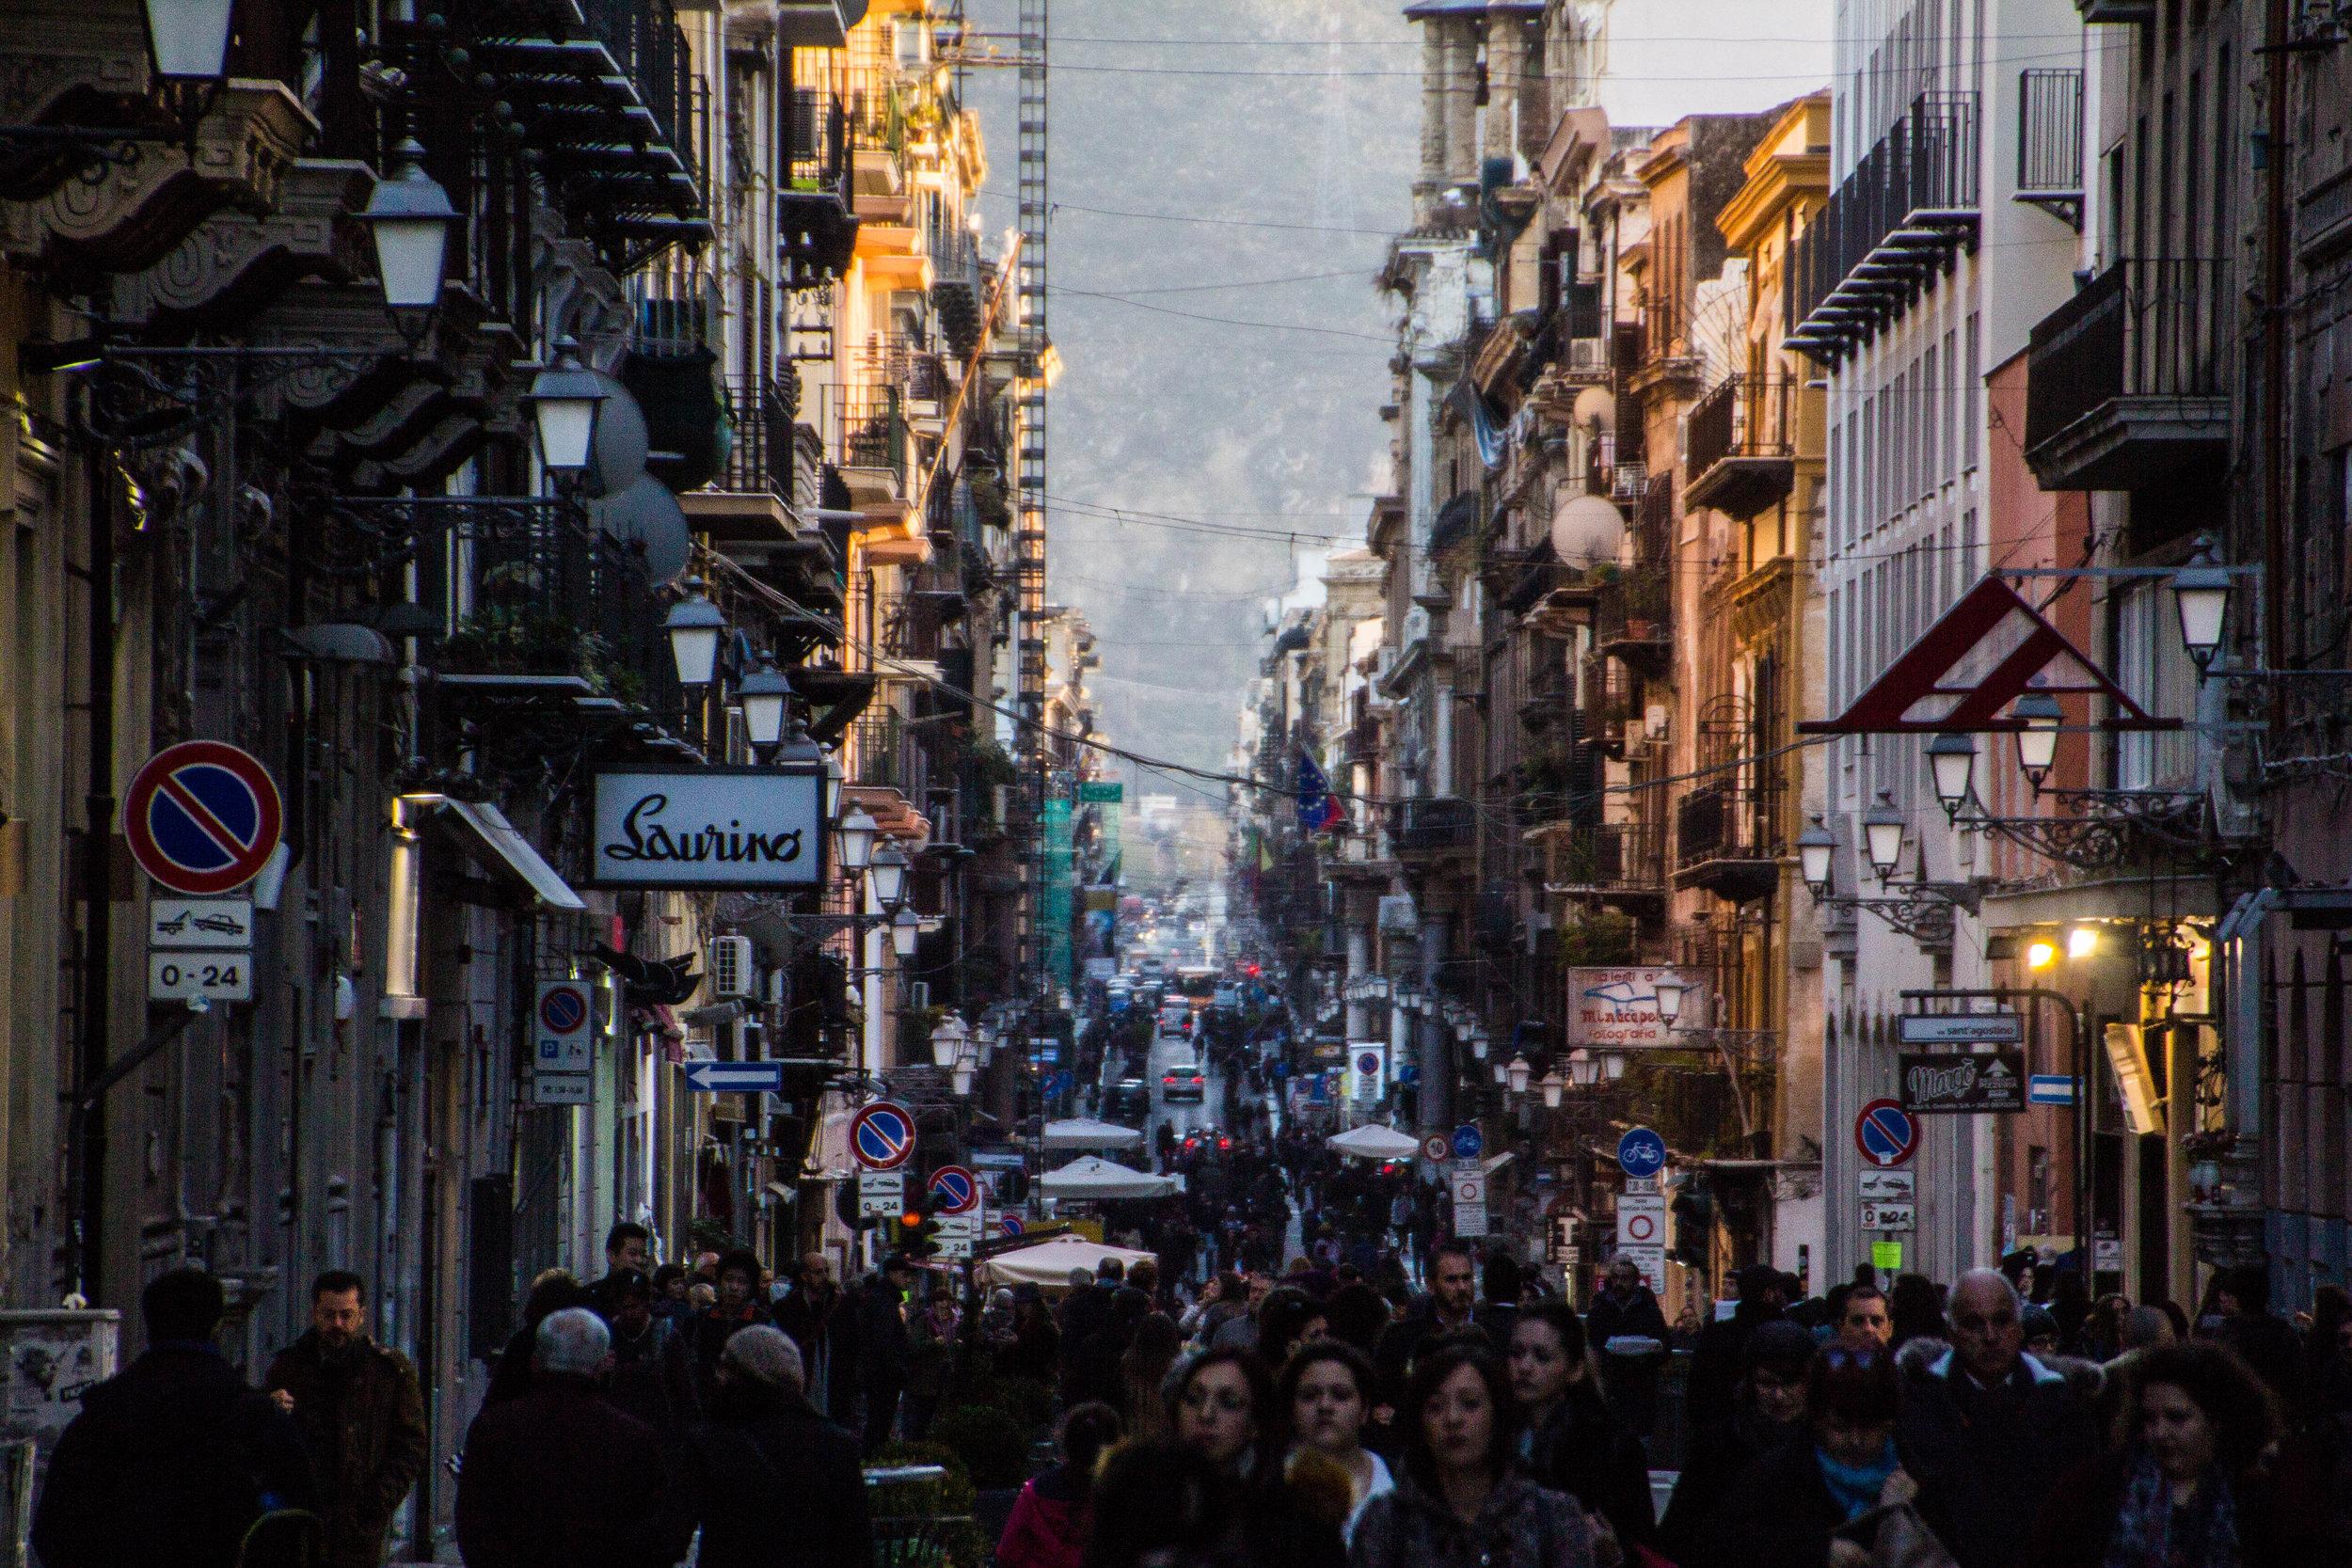 streets-palermo-sicily-21.jpg